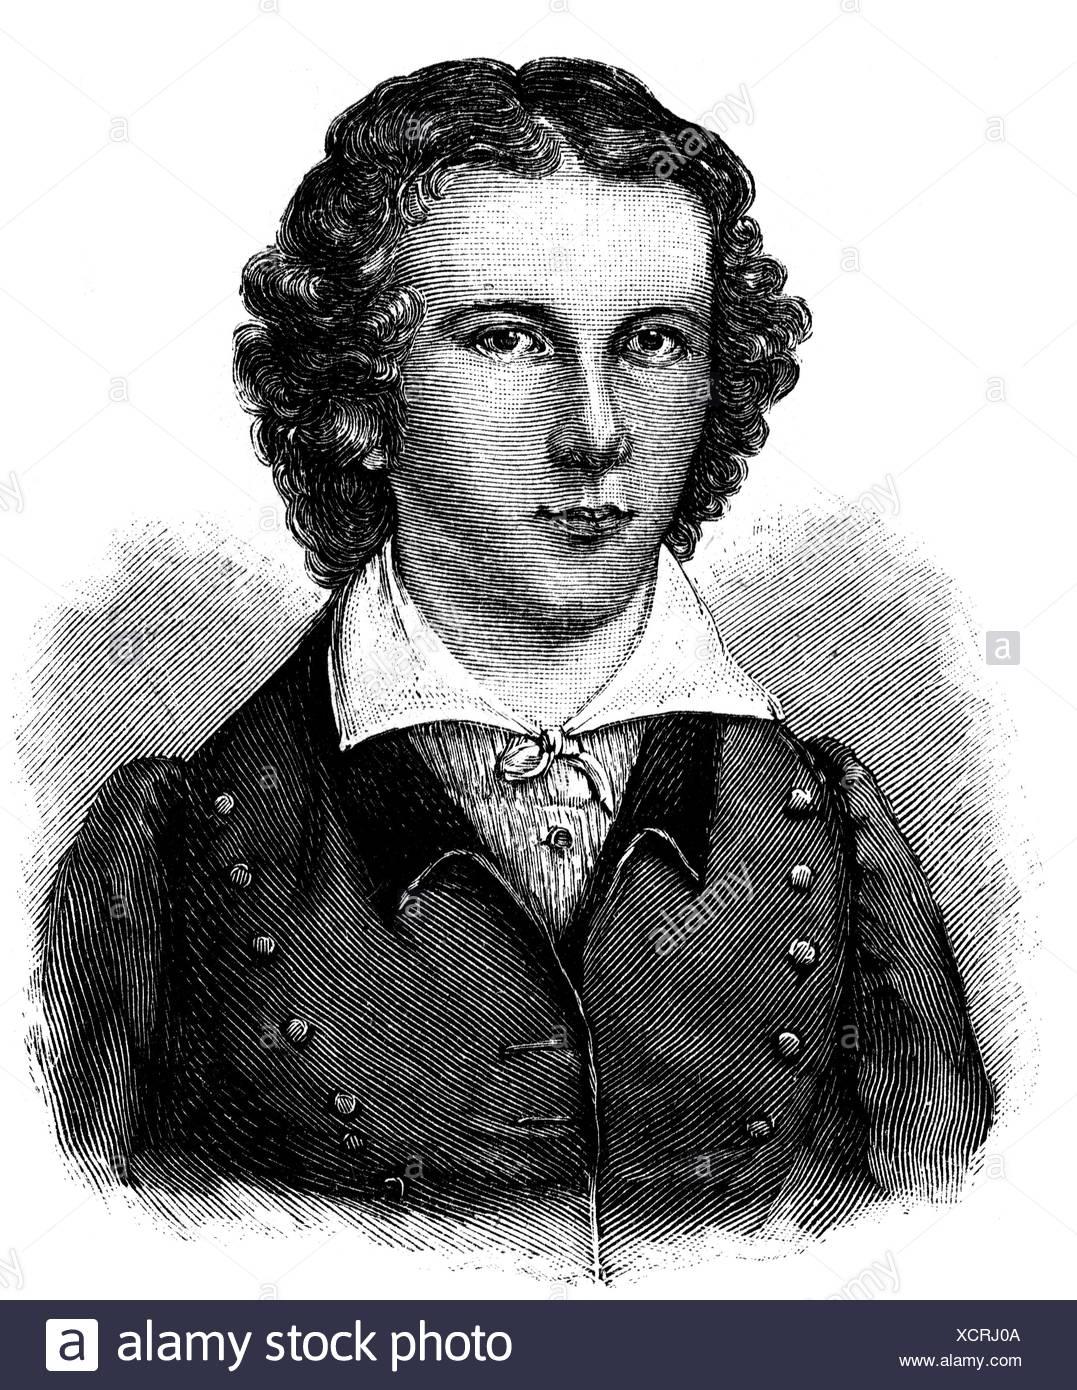 Scheidler, Karl Hermann, 1795 - 1866, German lawyer, philosophy professor, portrait, as student of the fraternity 'Arminia', - Stock Image